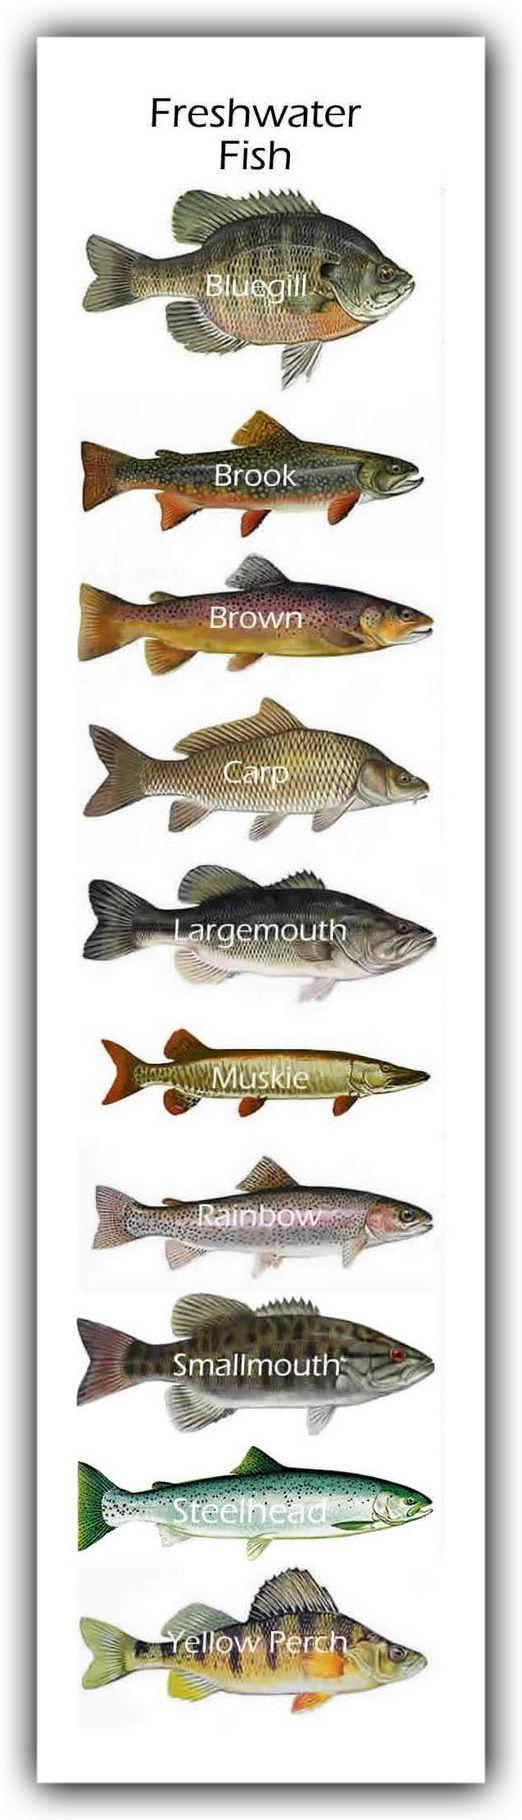 Freshwater fish jobs winnipeg - Freshwater Fish